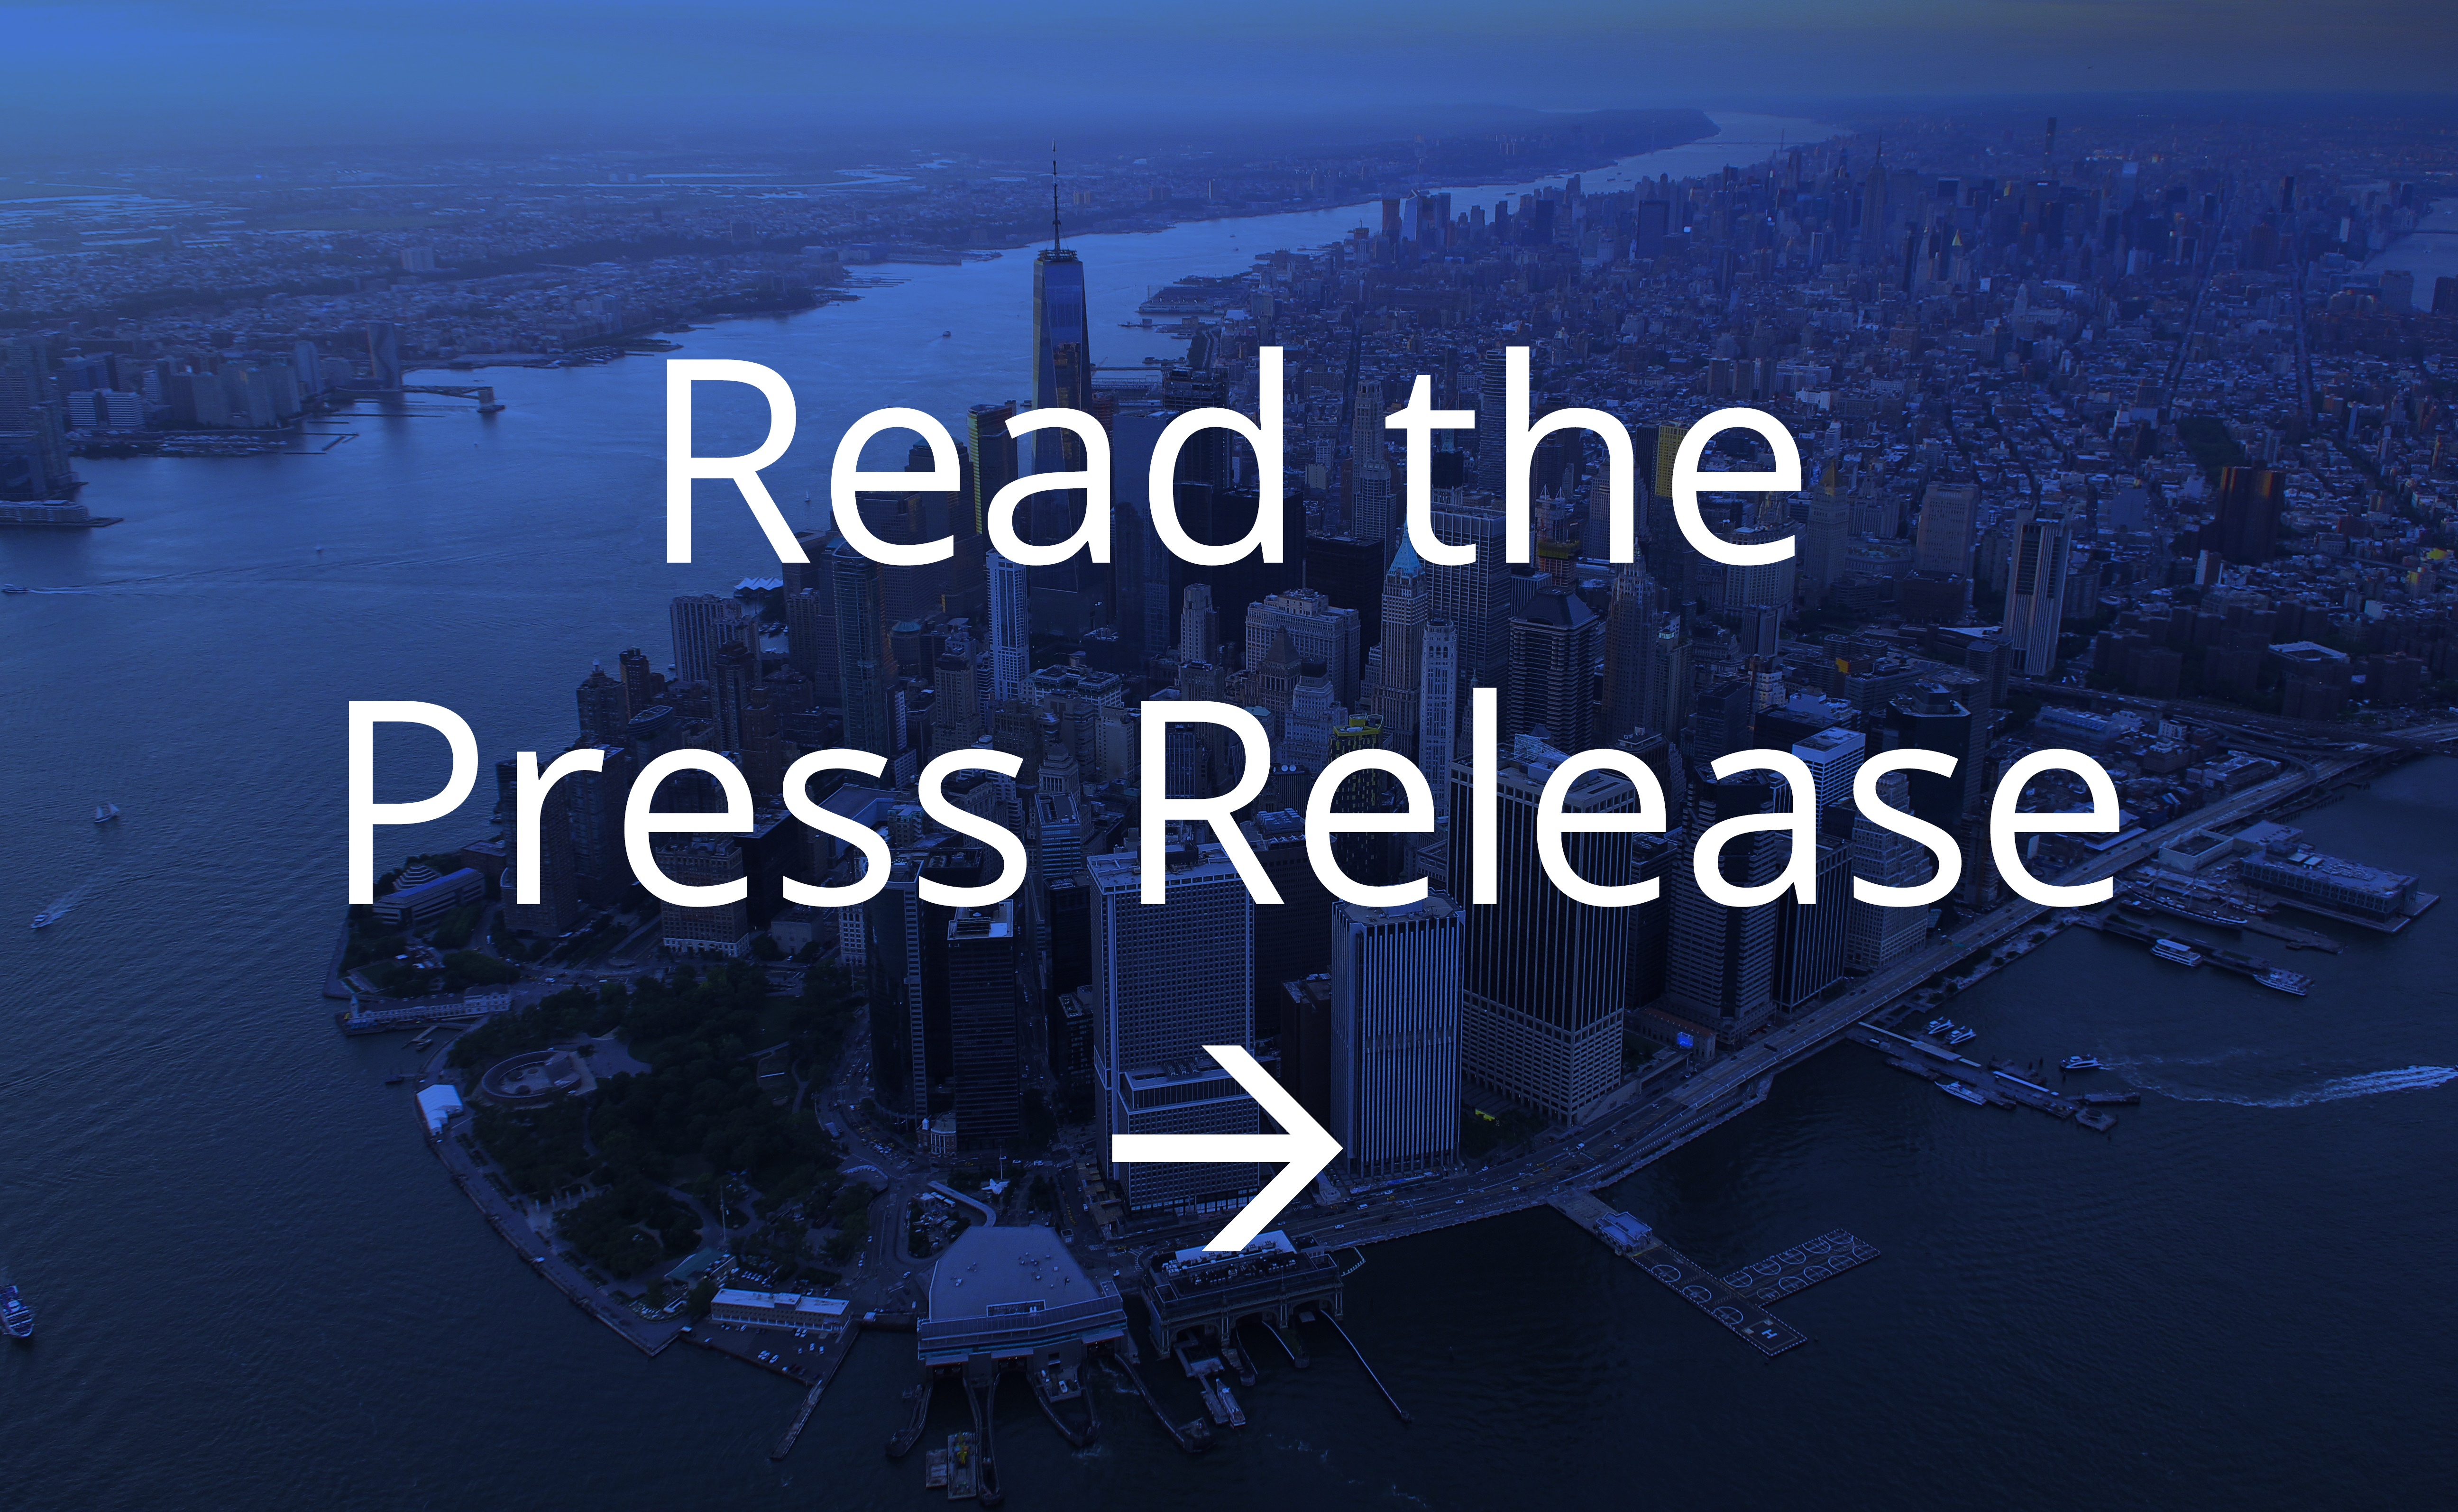 Visible Alpha Capital Raise Press Release Promo.jpg